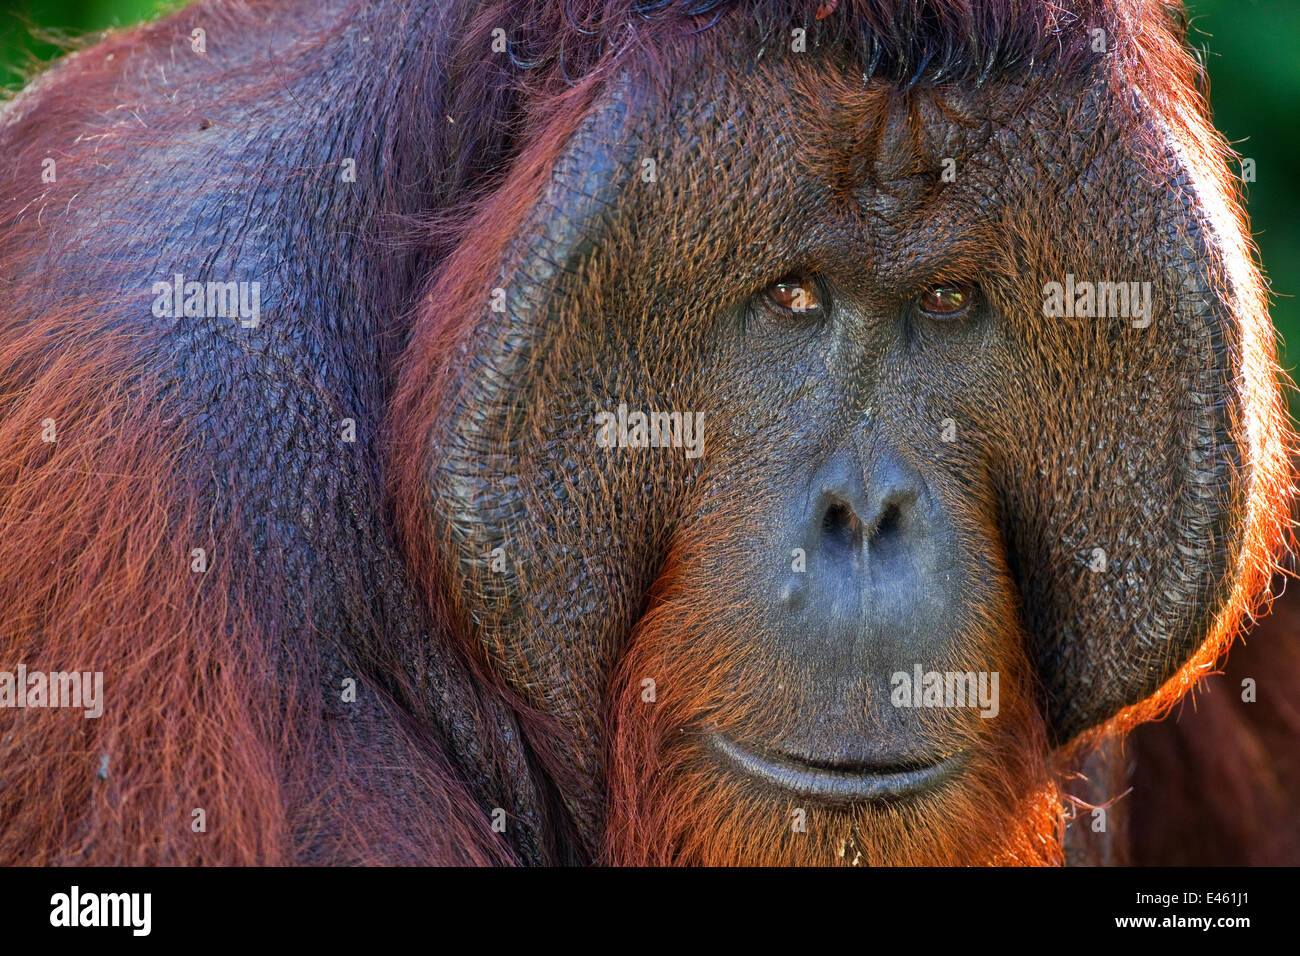 Bornean Orang-utan (Pongo pygmaeus wurmbii) mature male 'Tom' head and shoulders portrait. Camp Leakey, - Stock Image